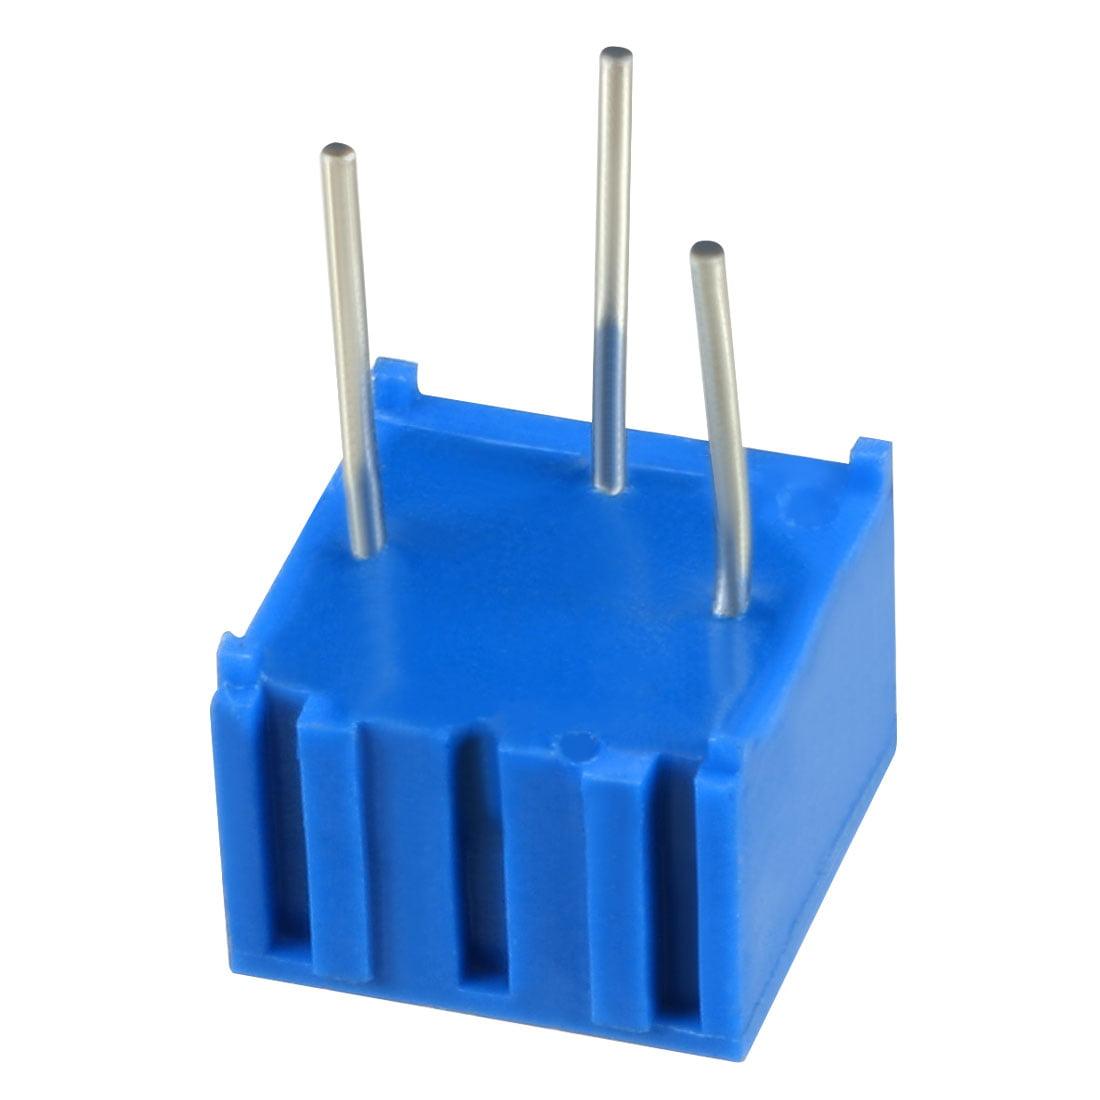 Resistors 200k Ohm Top Adjustment Horizontal Cermet Potentiometer 20 Pcs - image 1 de 6